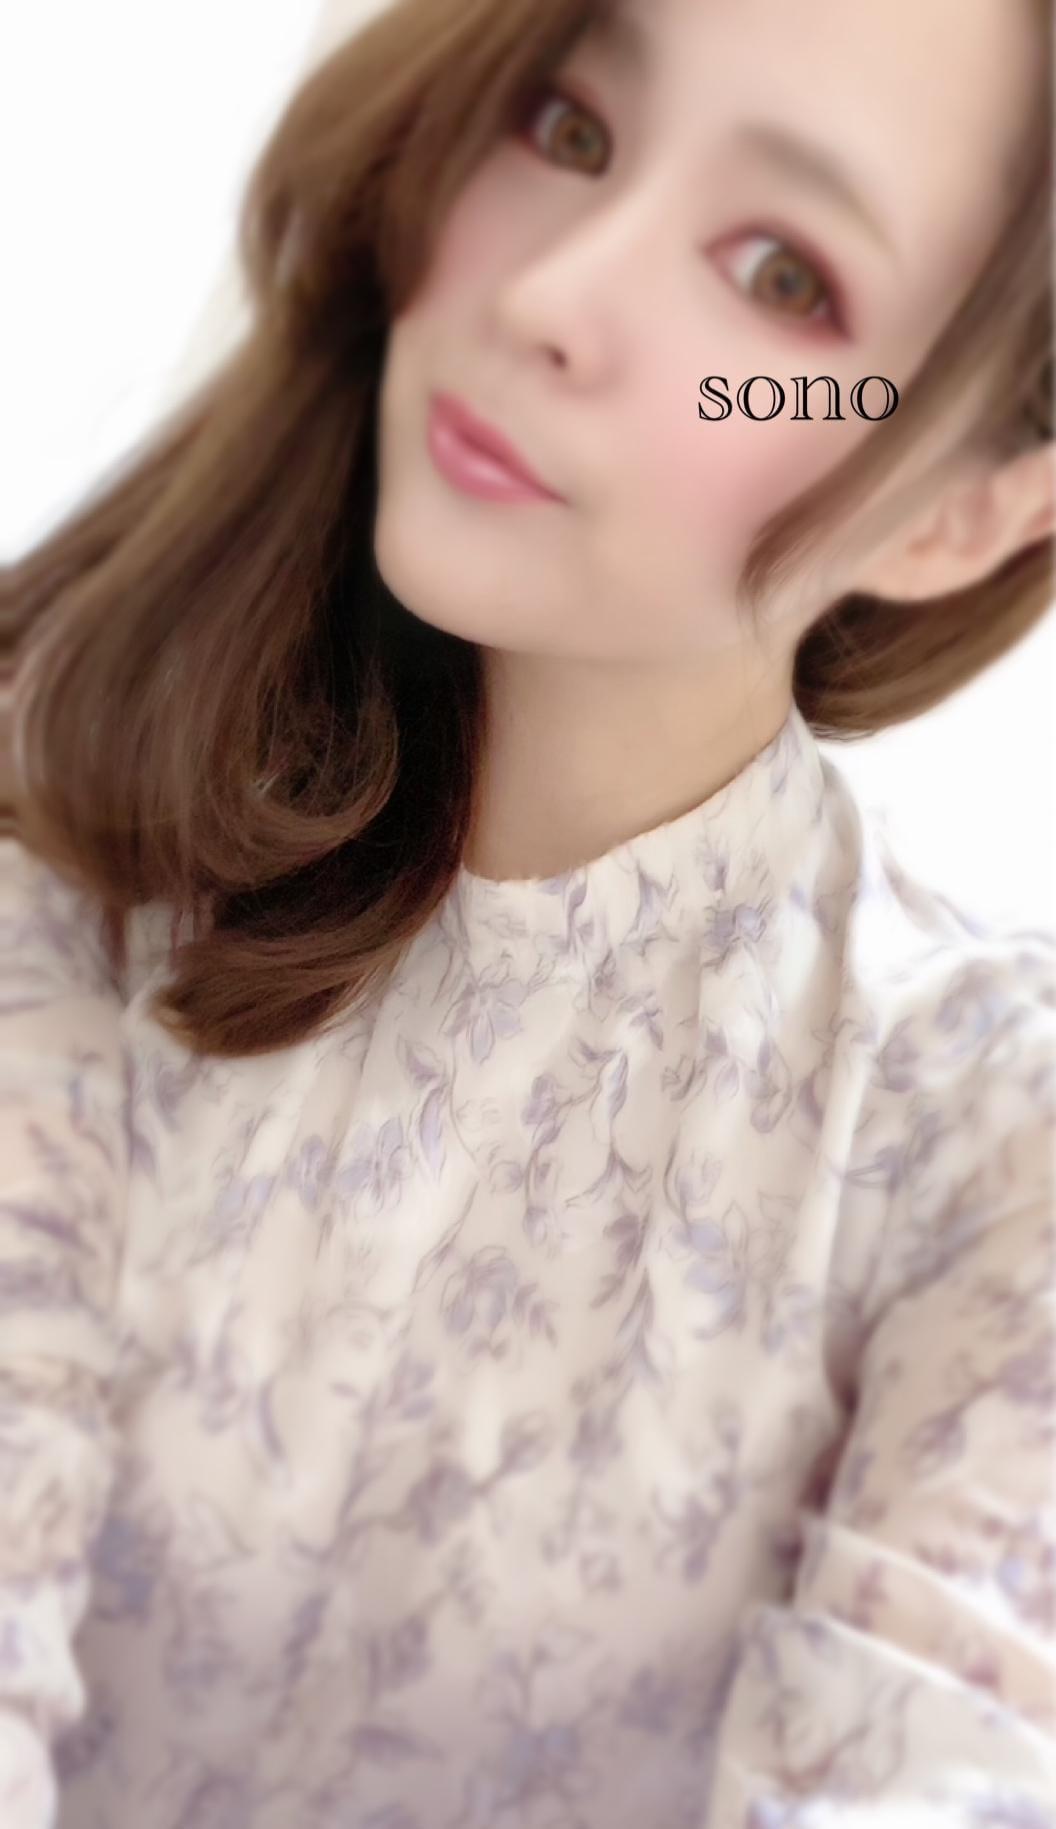 「Today's sono」05/07(金) 18:44 | 奏乃-その-の写メ・風俗動画